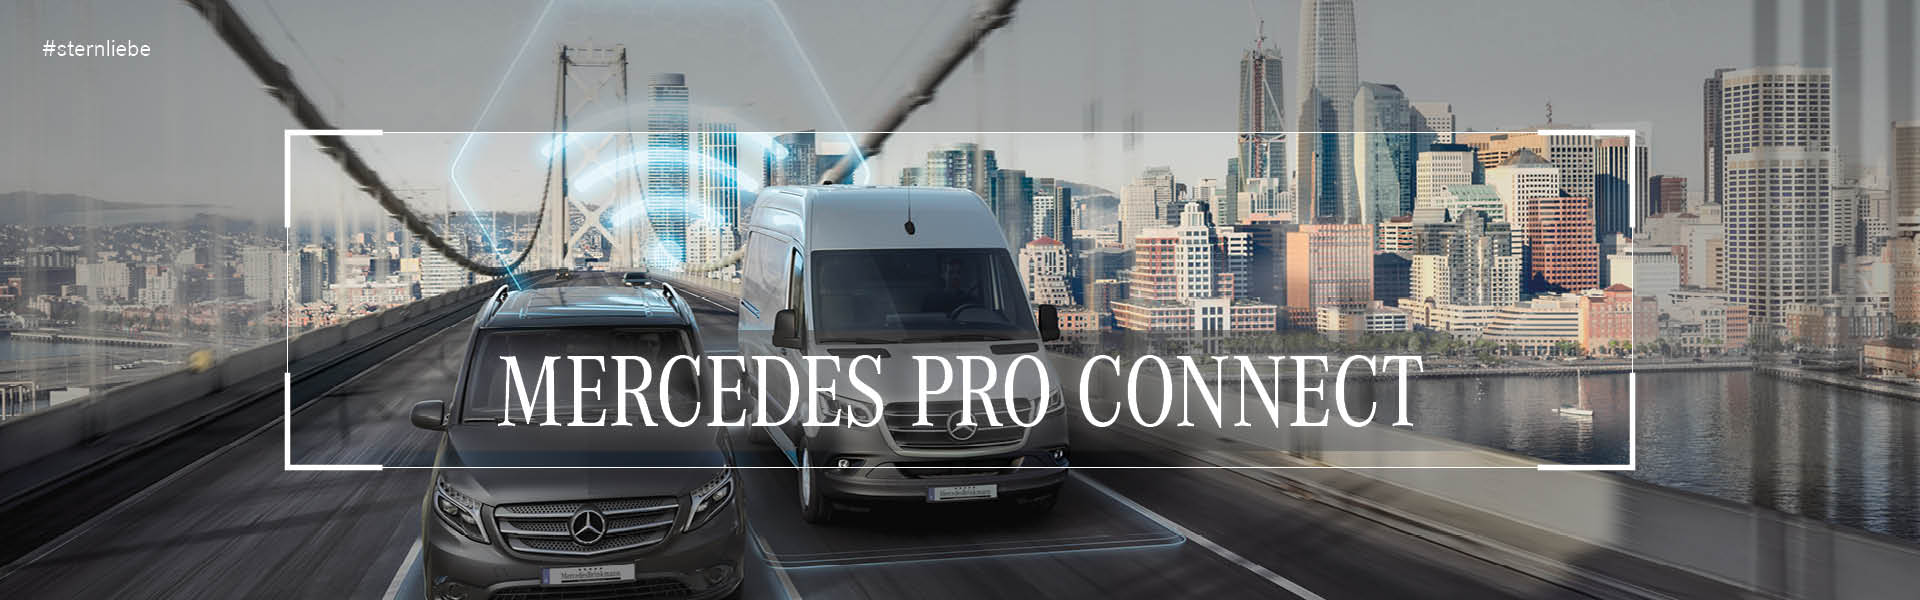 MercedesProConnect-Header